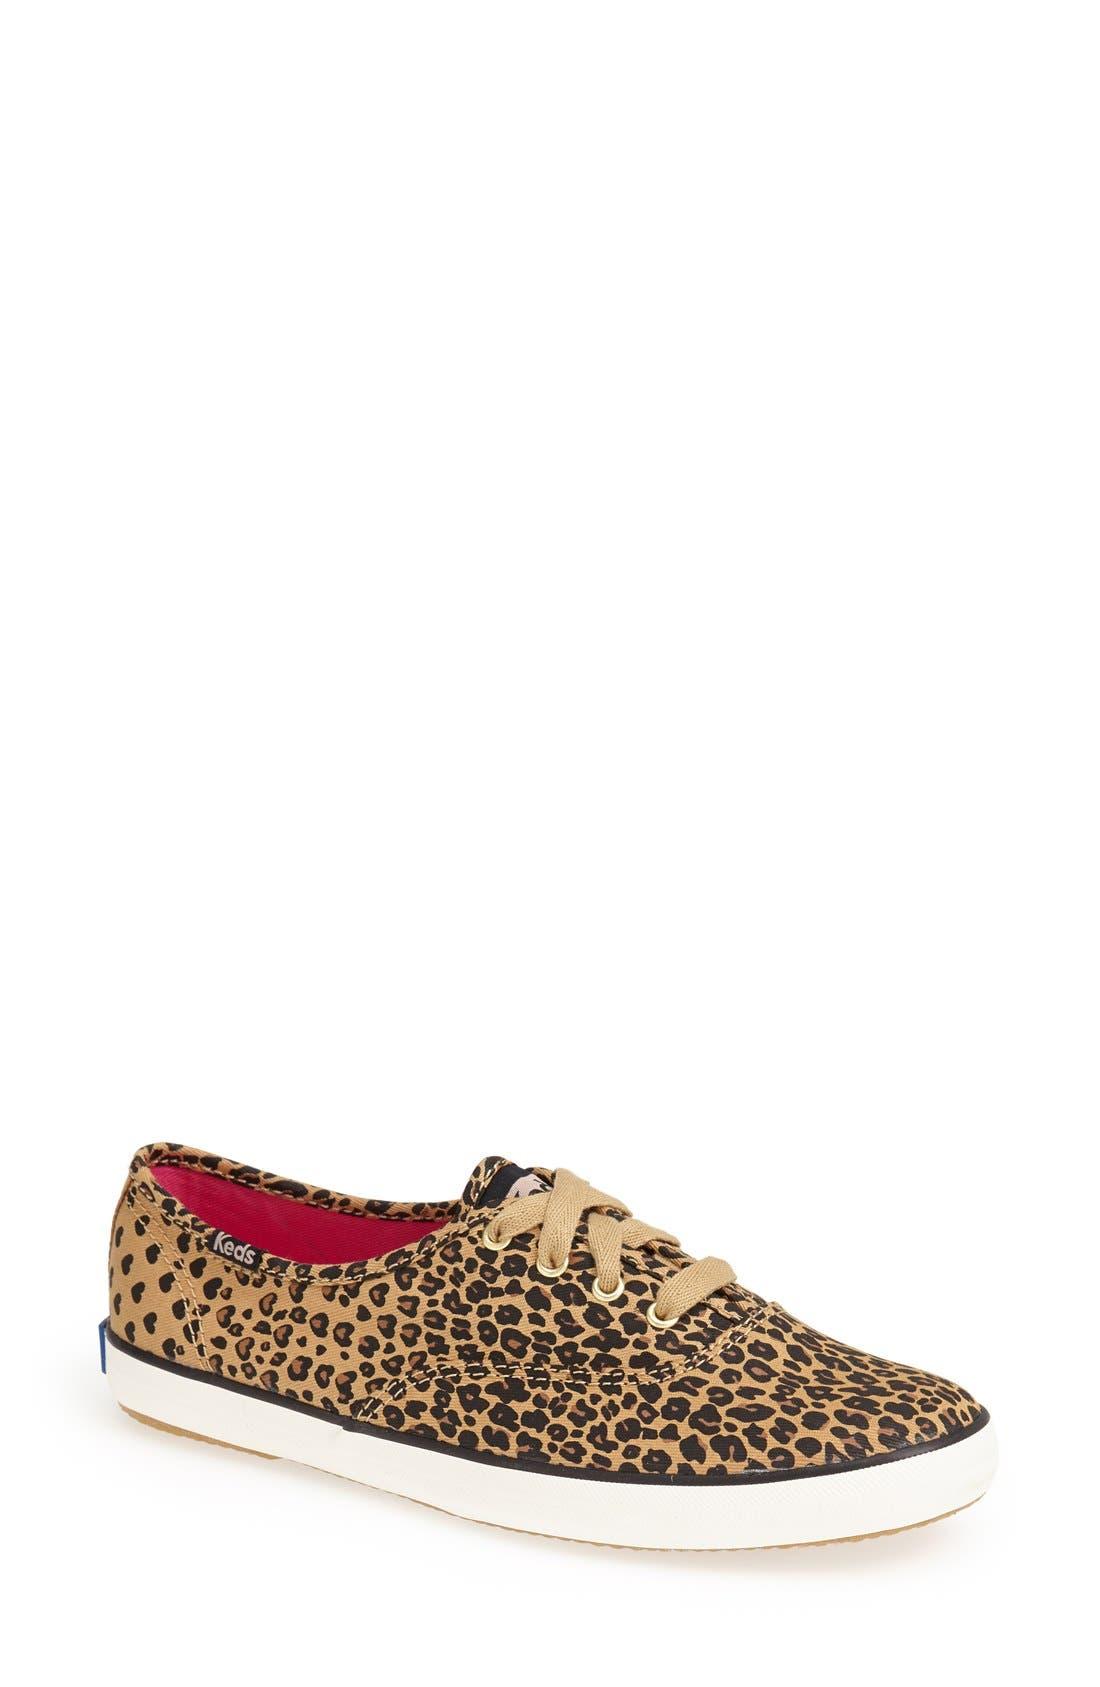 Main Image - Keds® 'Champion - Leopard' Sneaker (Women)